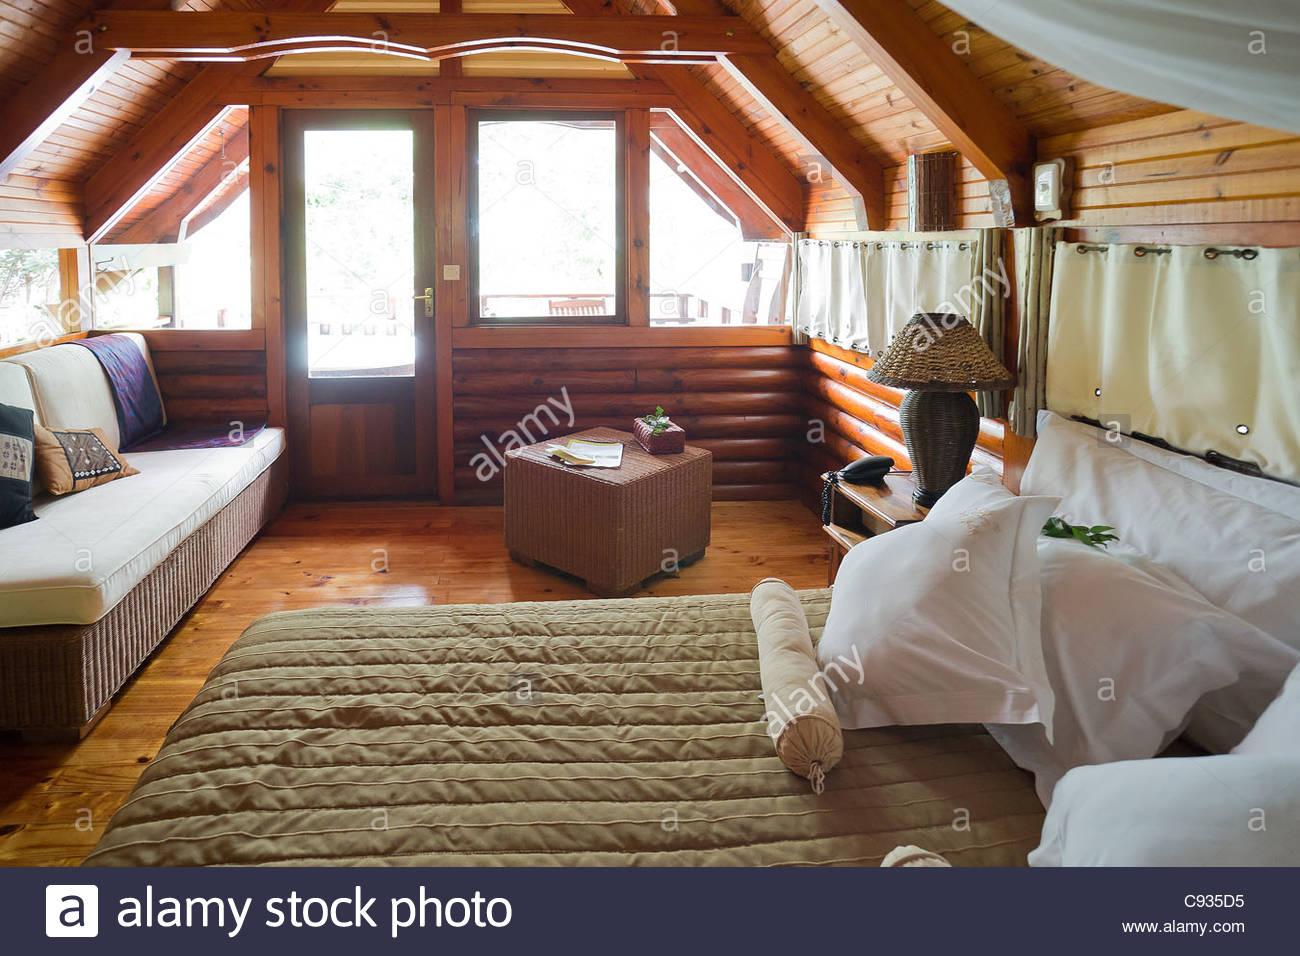 Roche Tamarin lodge at La Possession on Reunion island - Stock Image